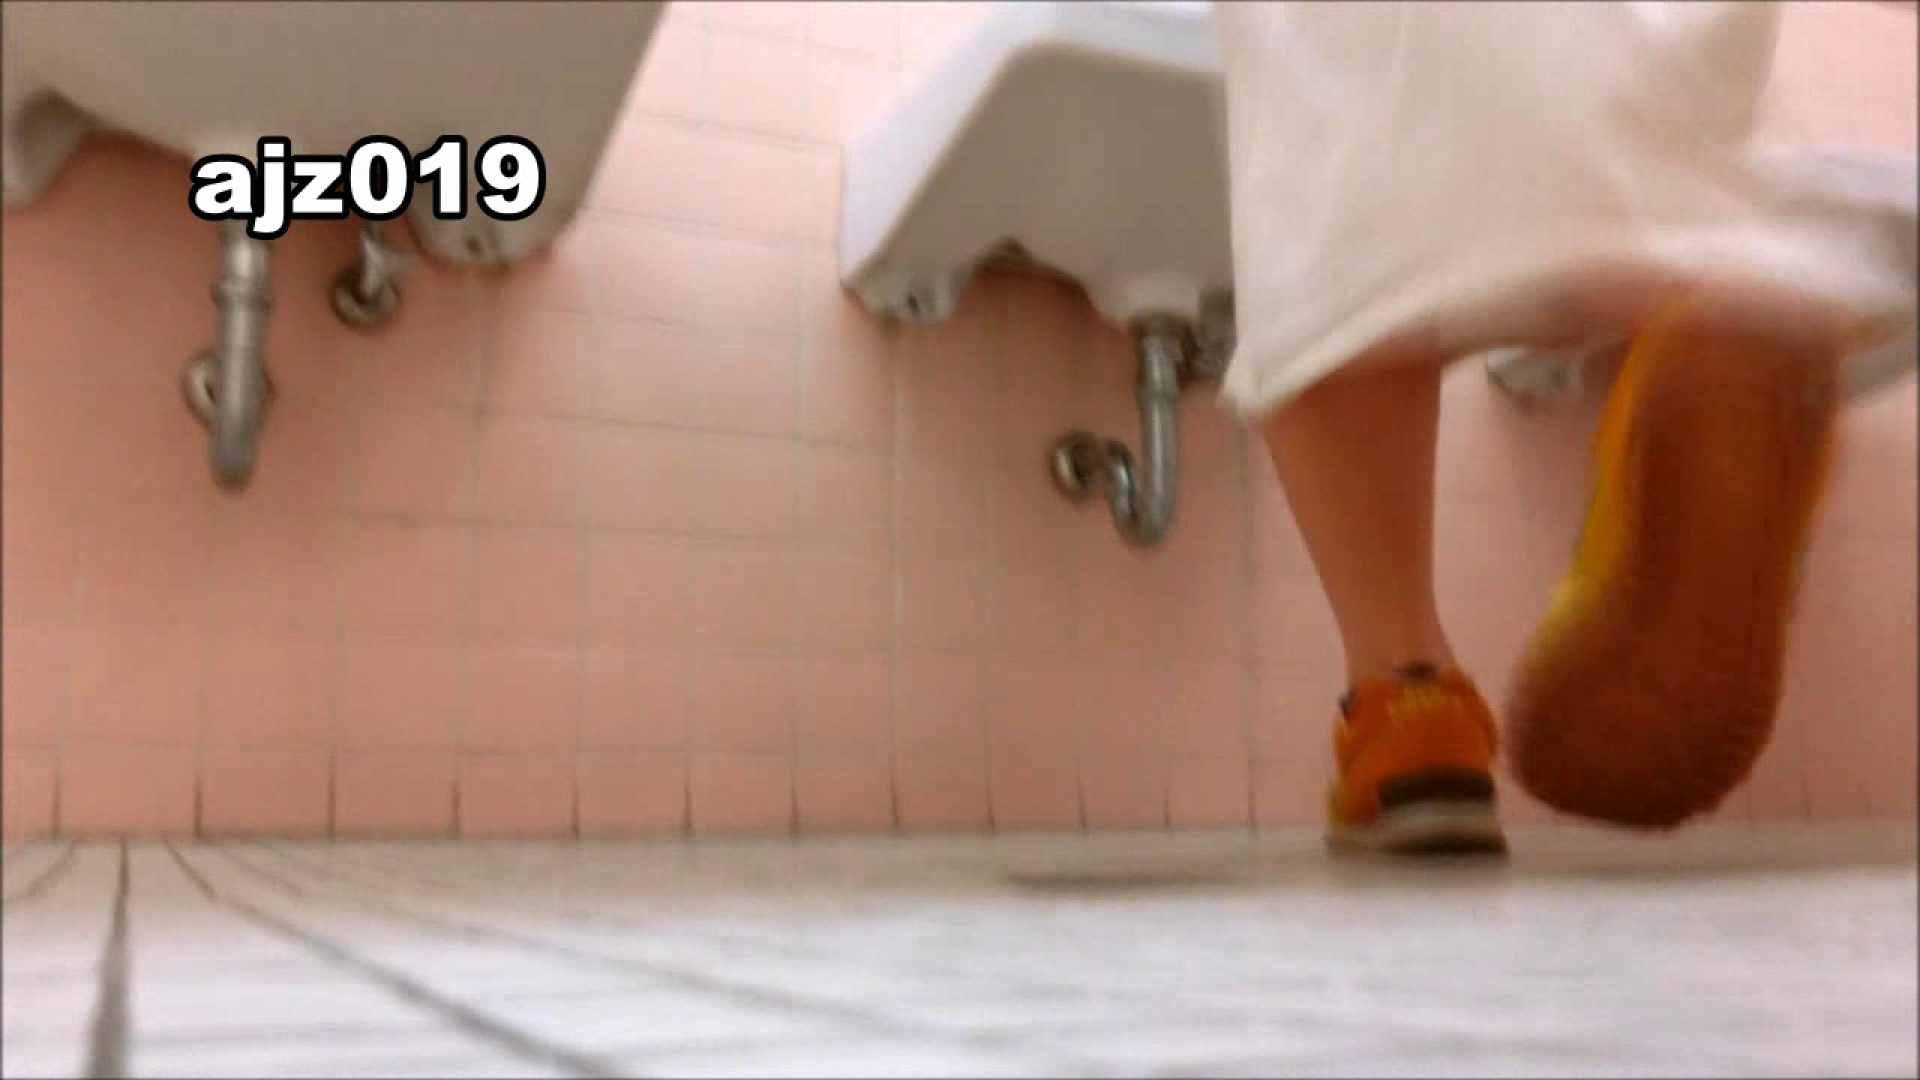 某有名大学女性洗面所 vol.19 OLのエロ生活 オマンコ無修正動画無料 82連発 18